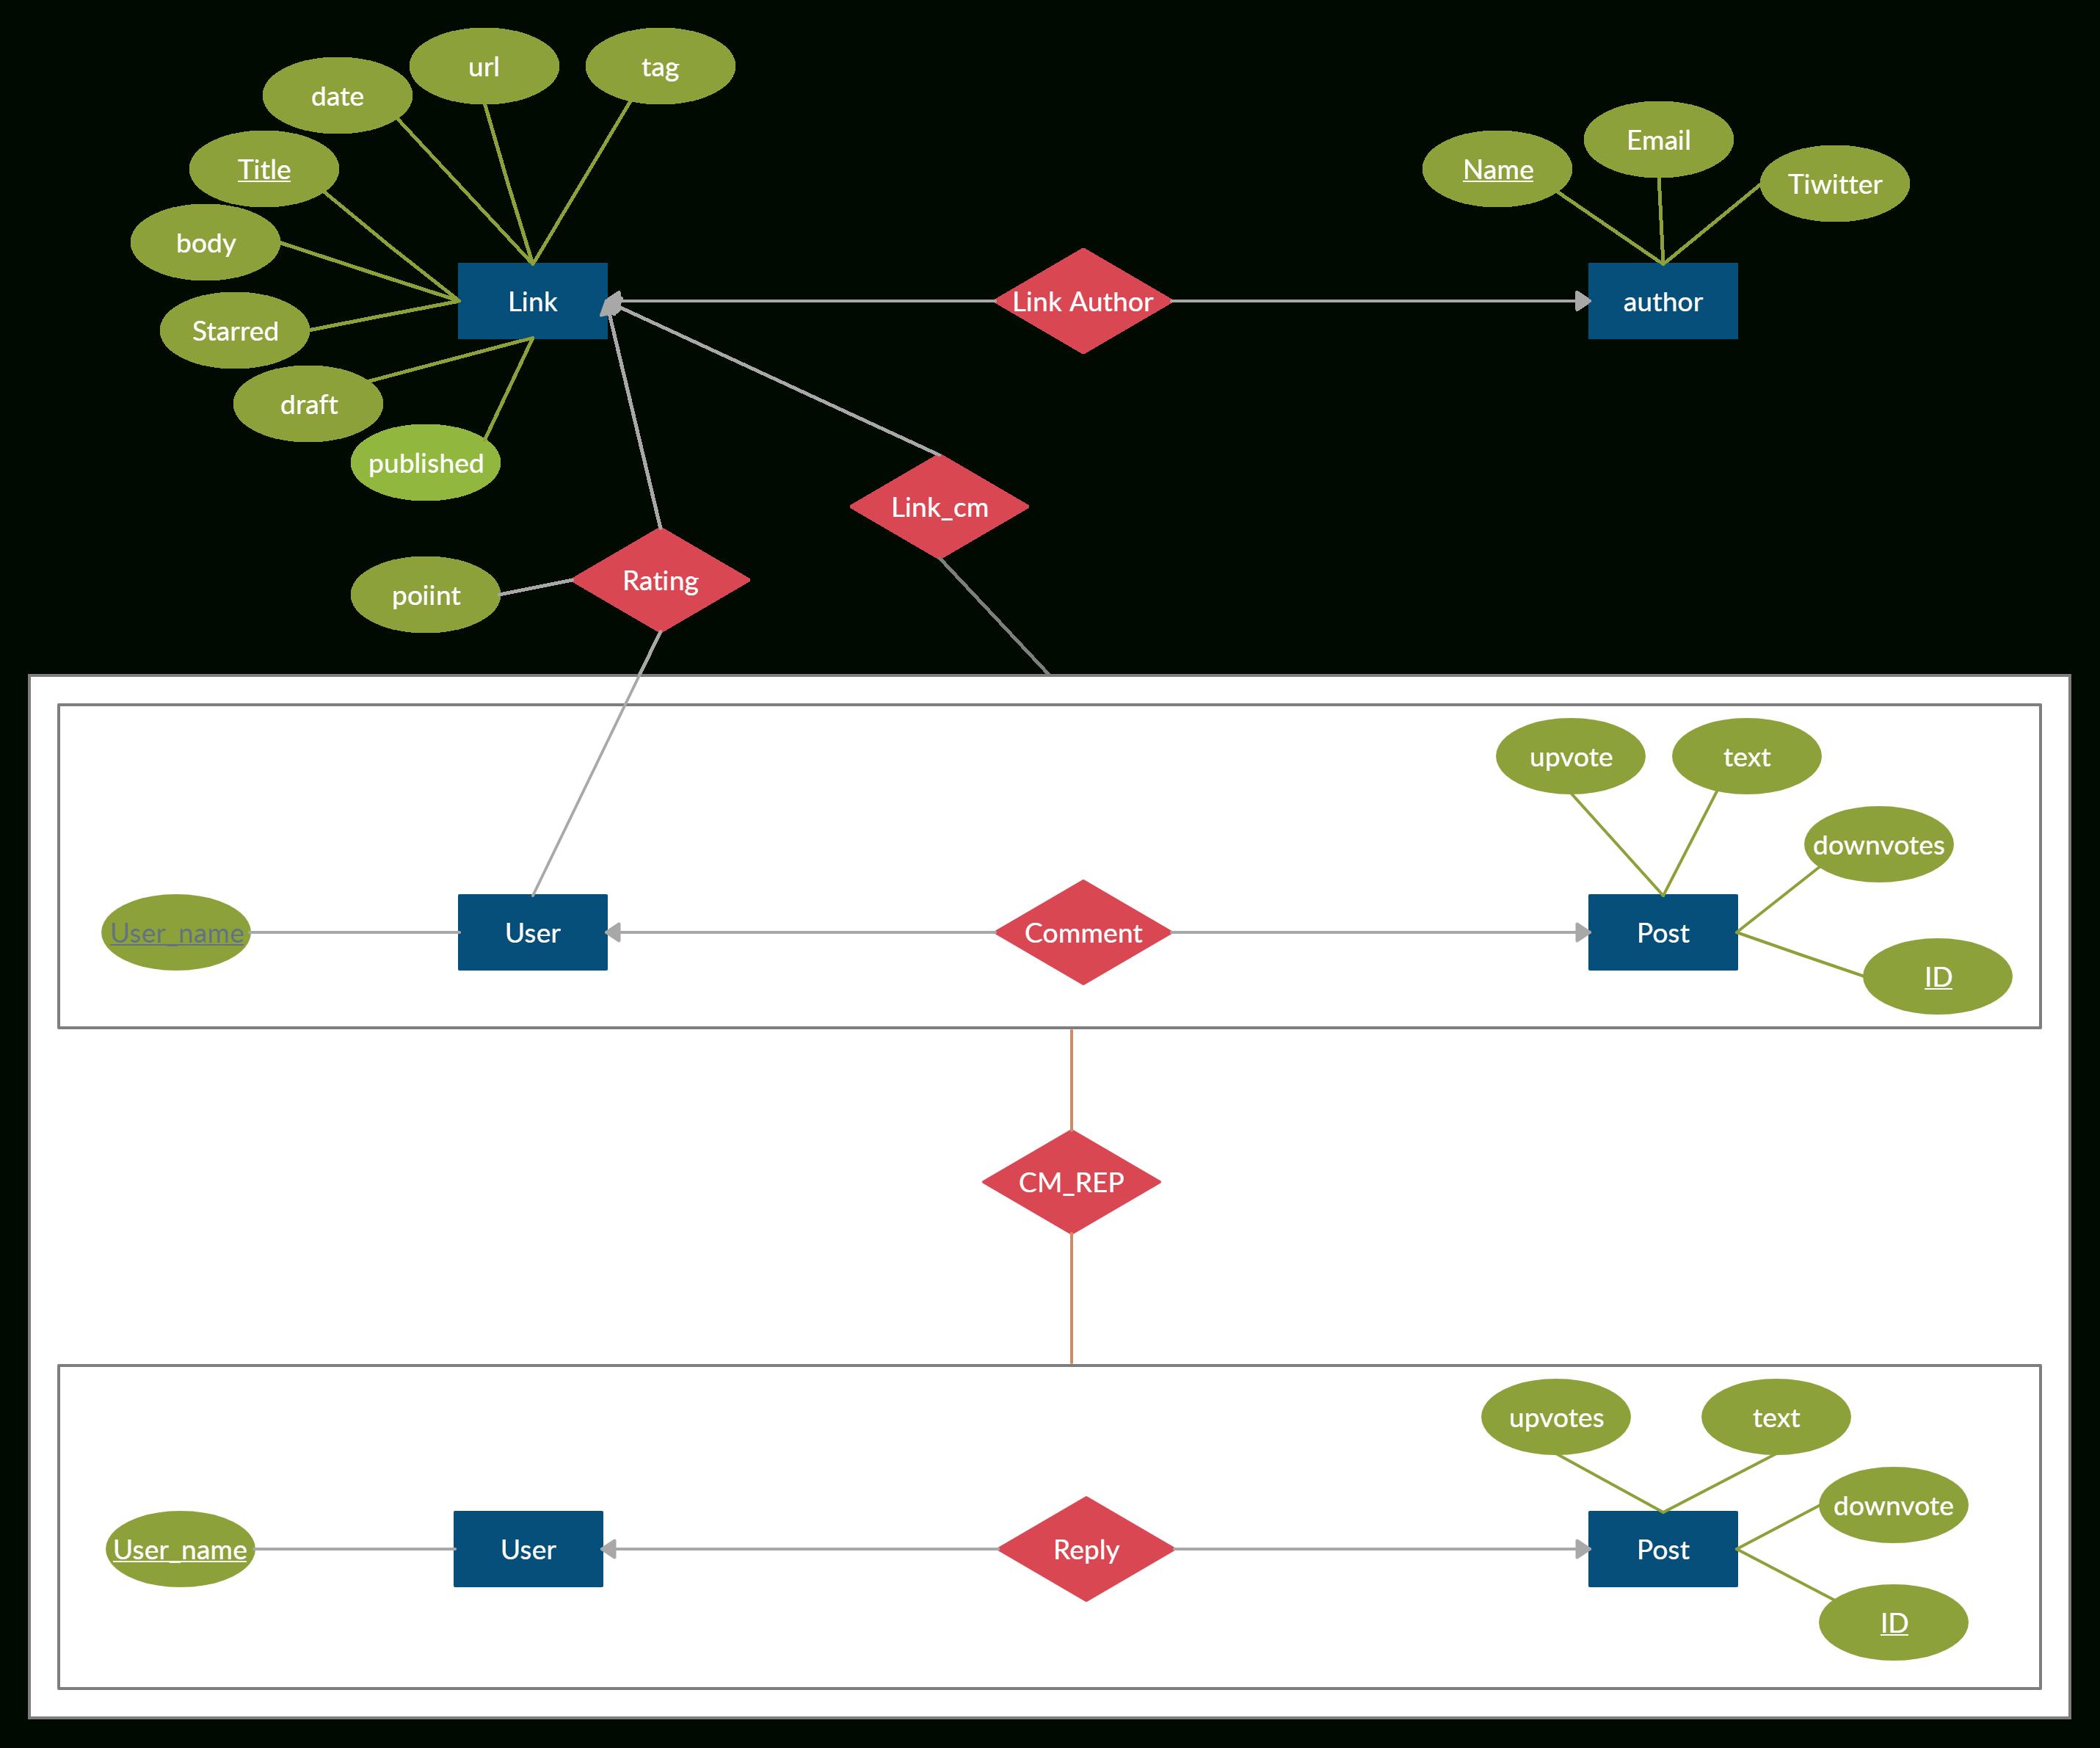 Mongodb Diagram   Relationship Diagram, Diagram, Templates